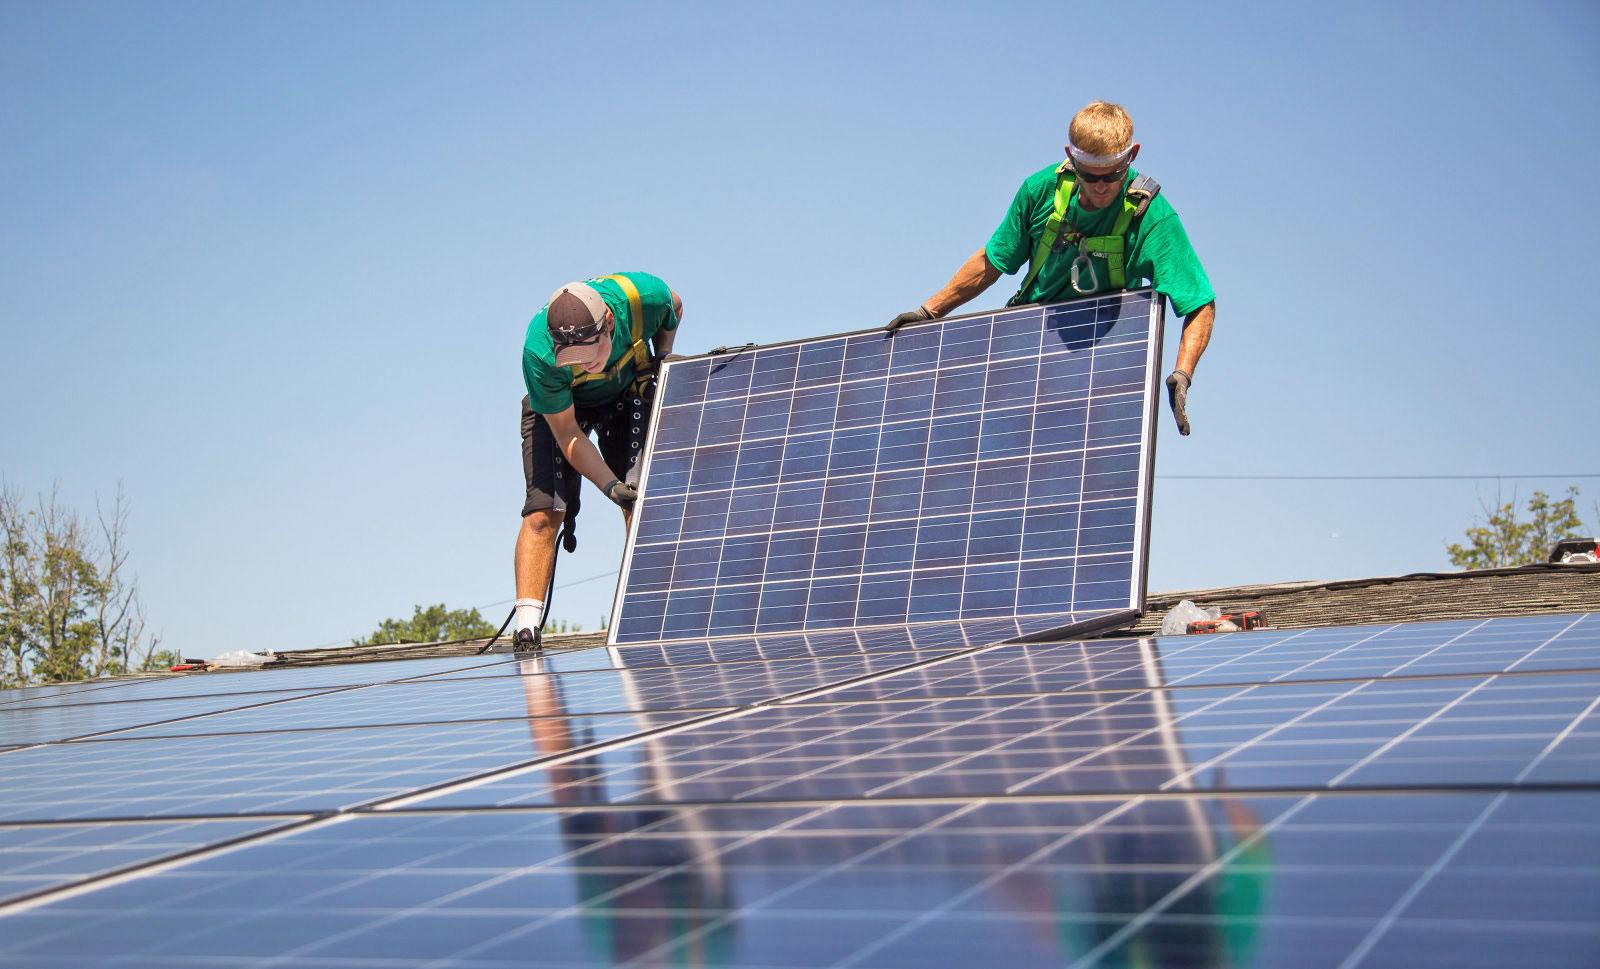 Tesla And Panasonic To Build Solar Panels For Powerwall